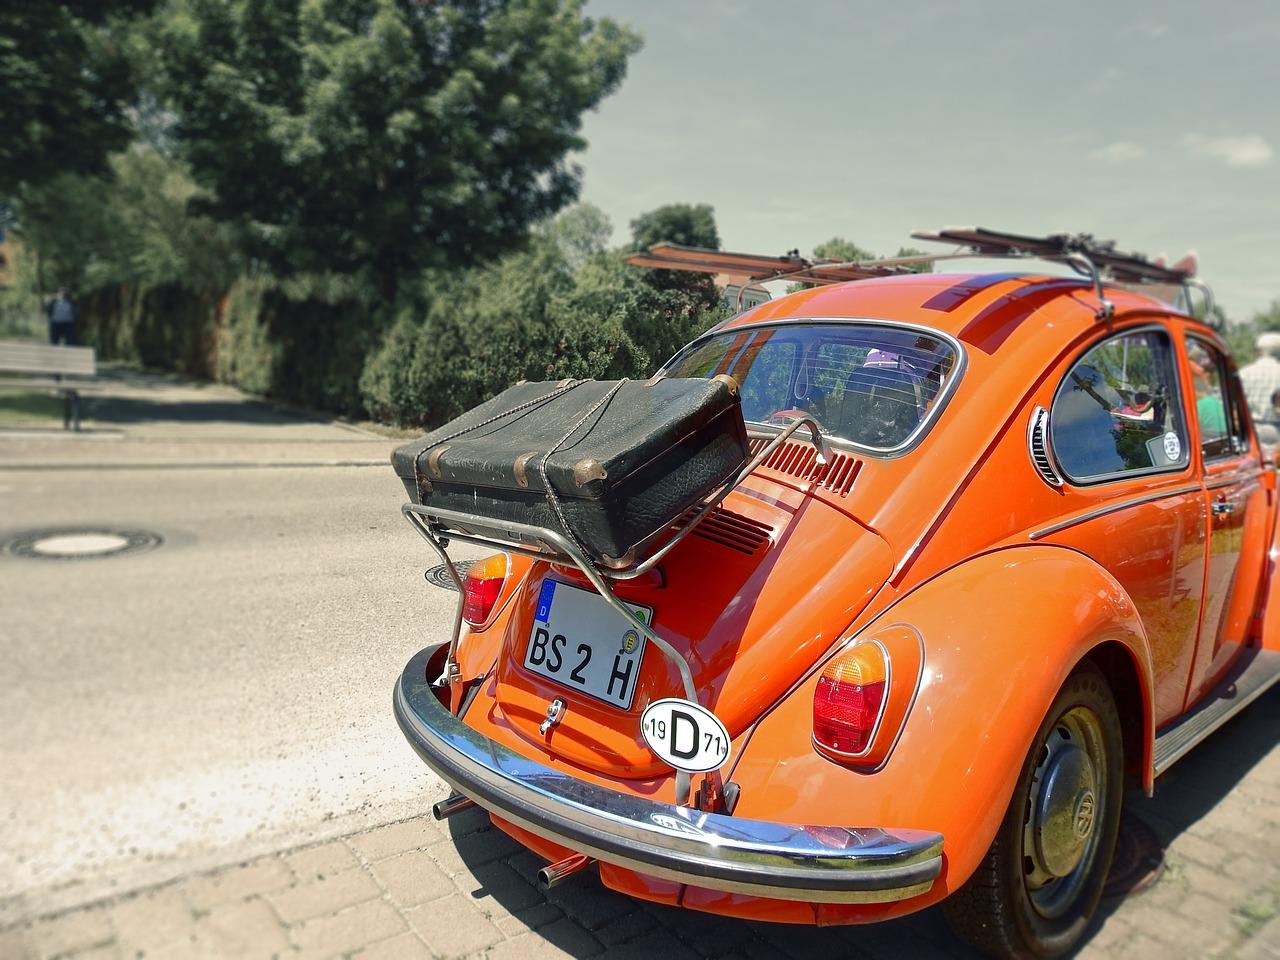 voiture orange bagages vacances voyage